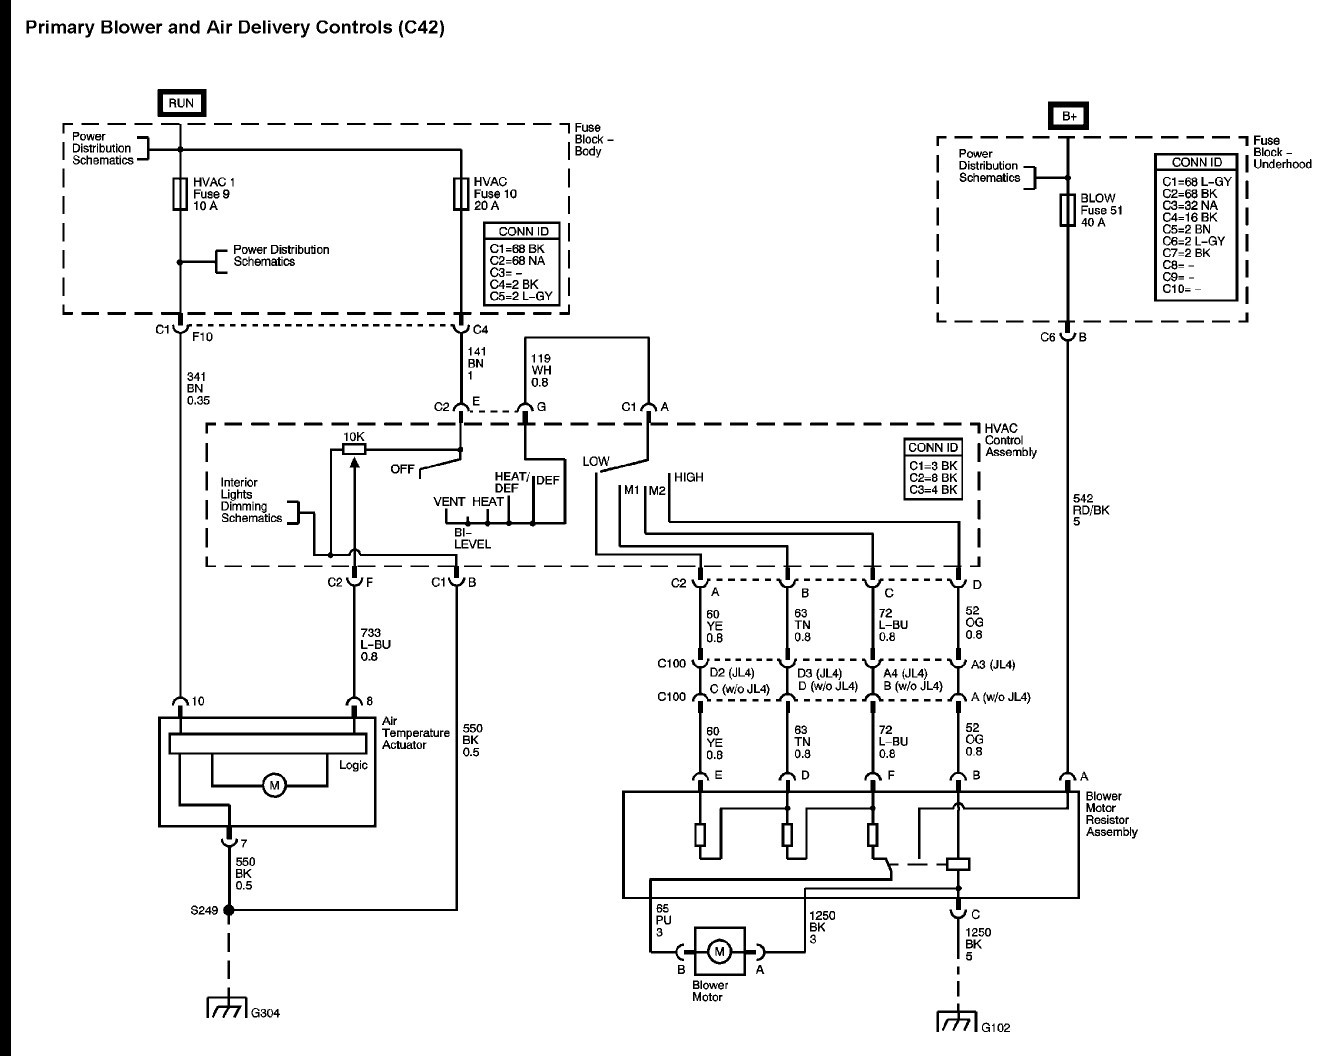 2008 cobalt ac wiring diagram schematics wiring diagrams u2022 rh seniorlivinguniversity co EZ Go Wiring Diagram EZ Go Wiring Diagram